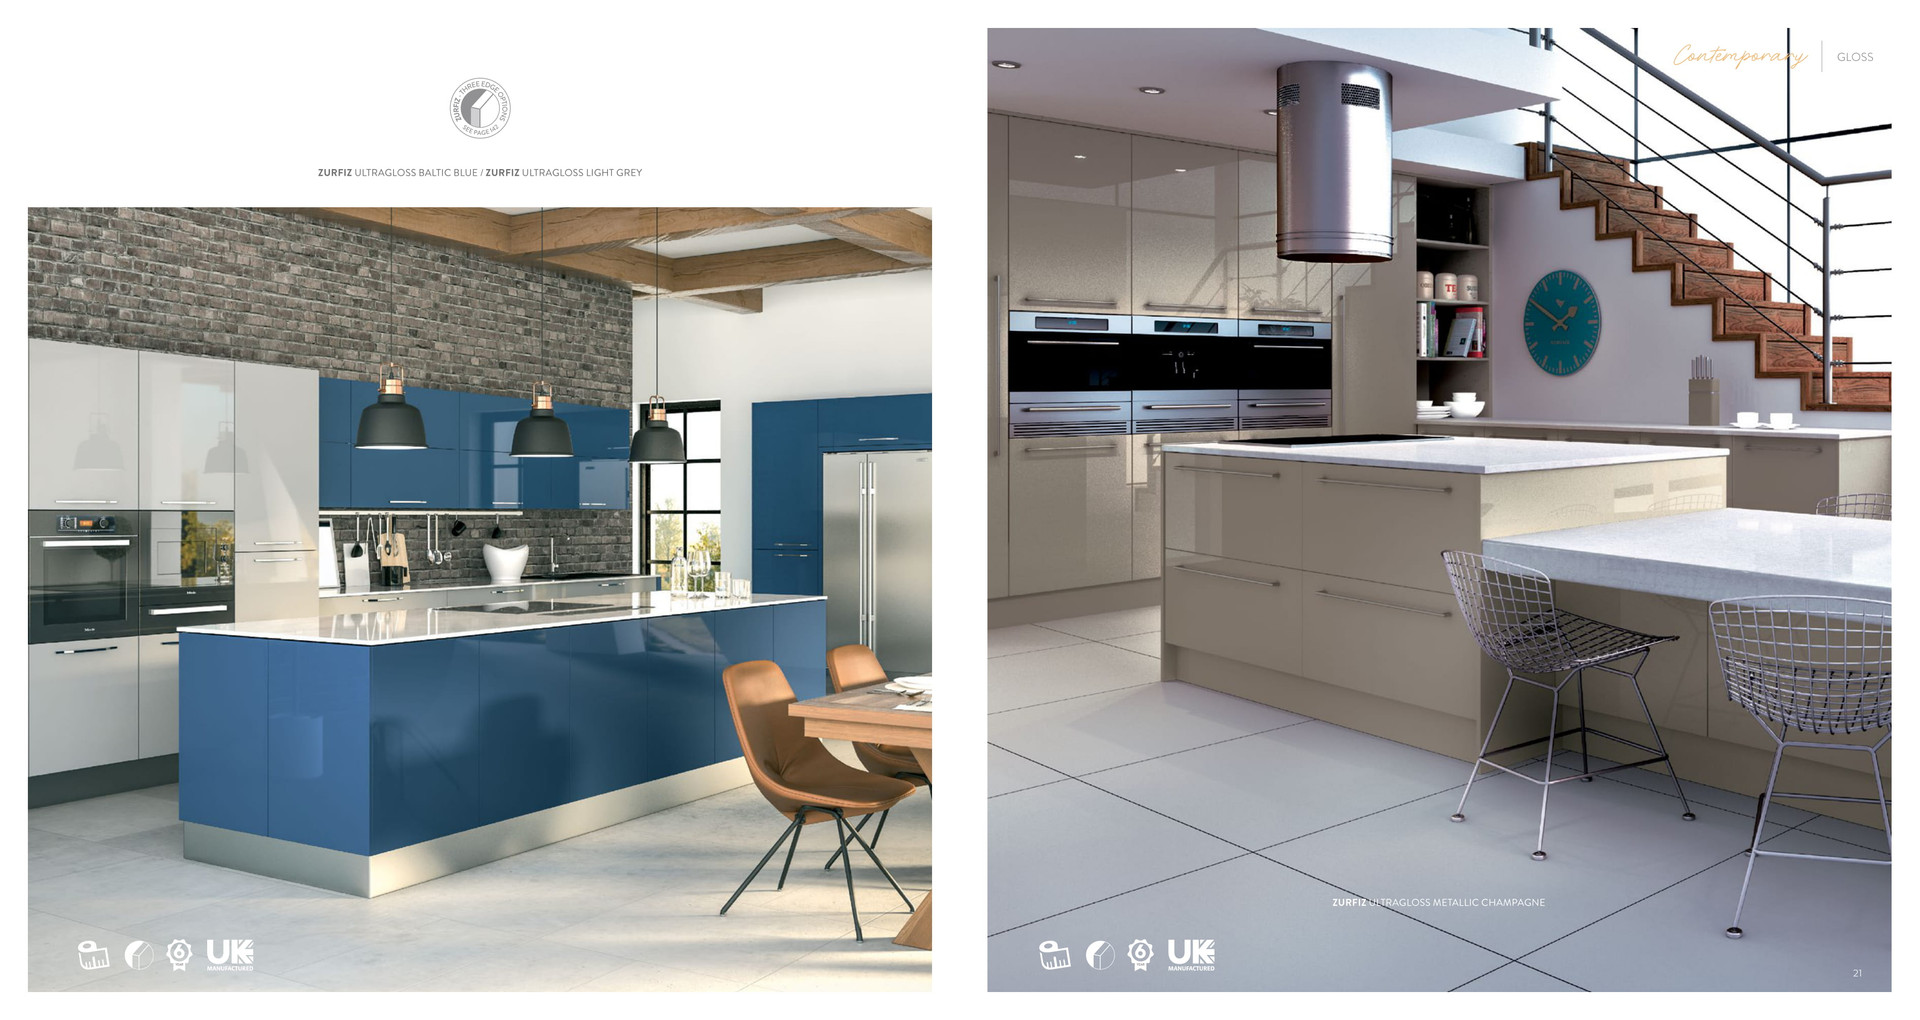 blossom-avenue-kitchen-brochure-2020-11.